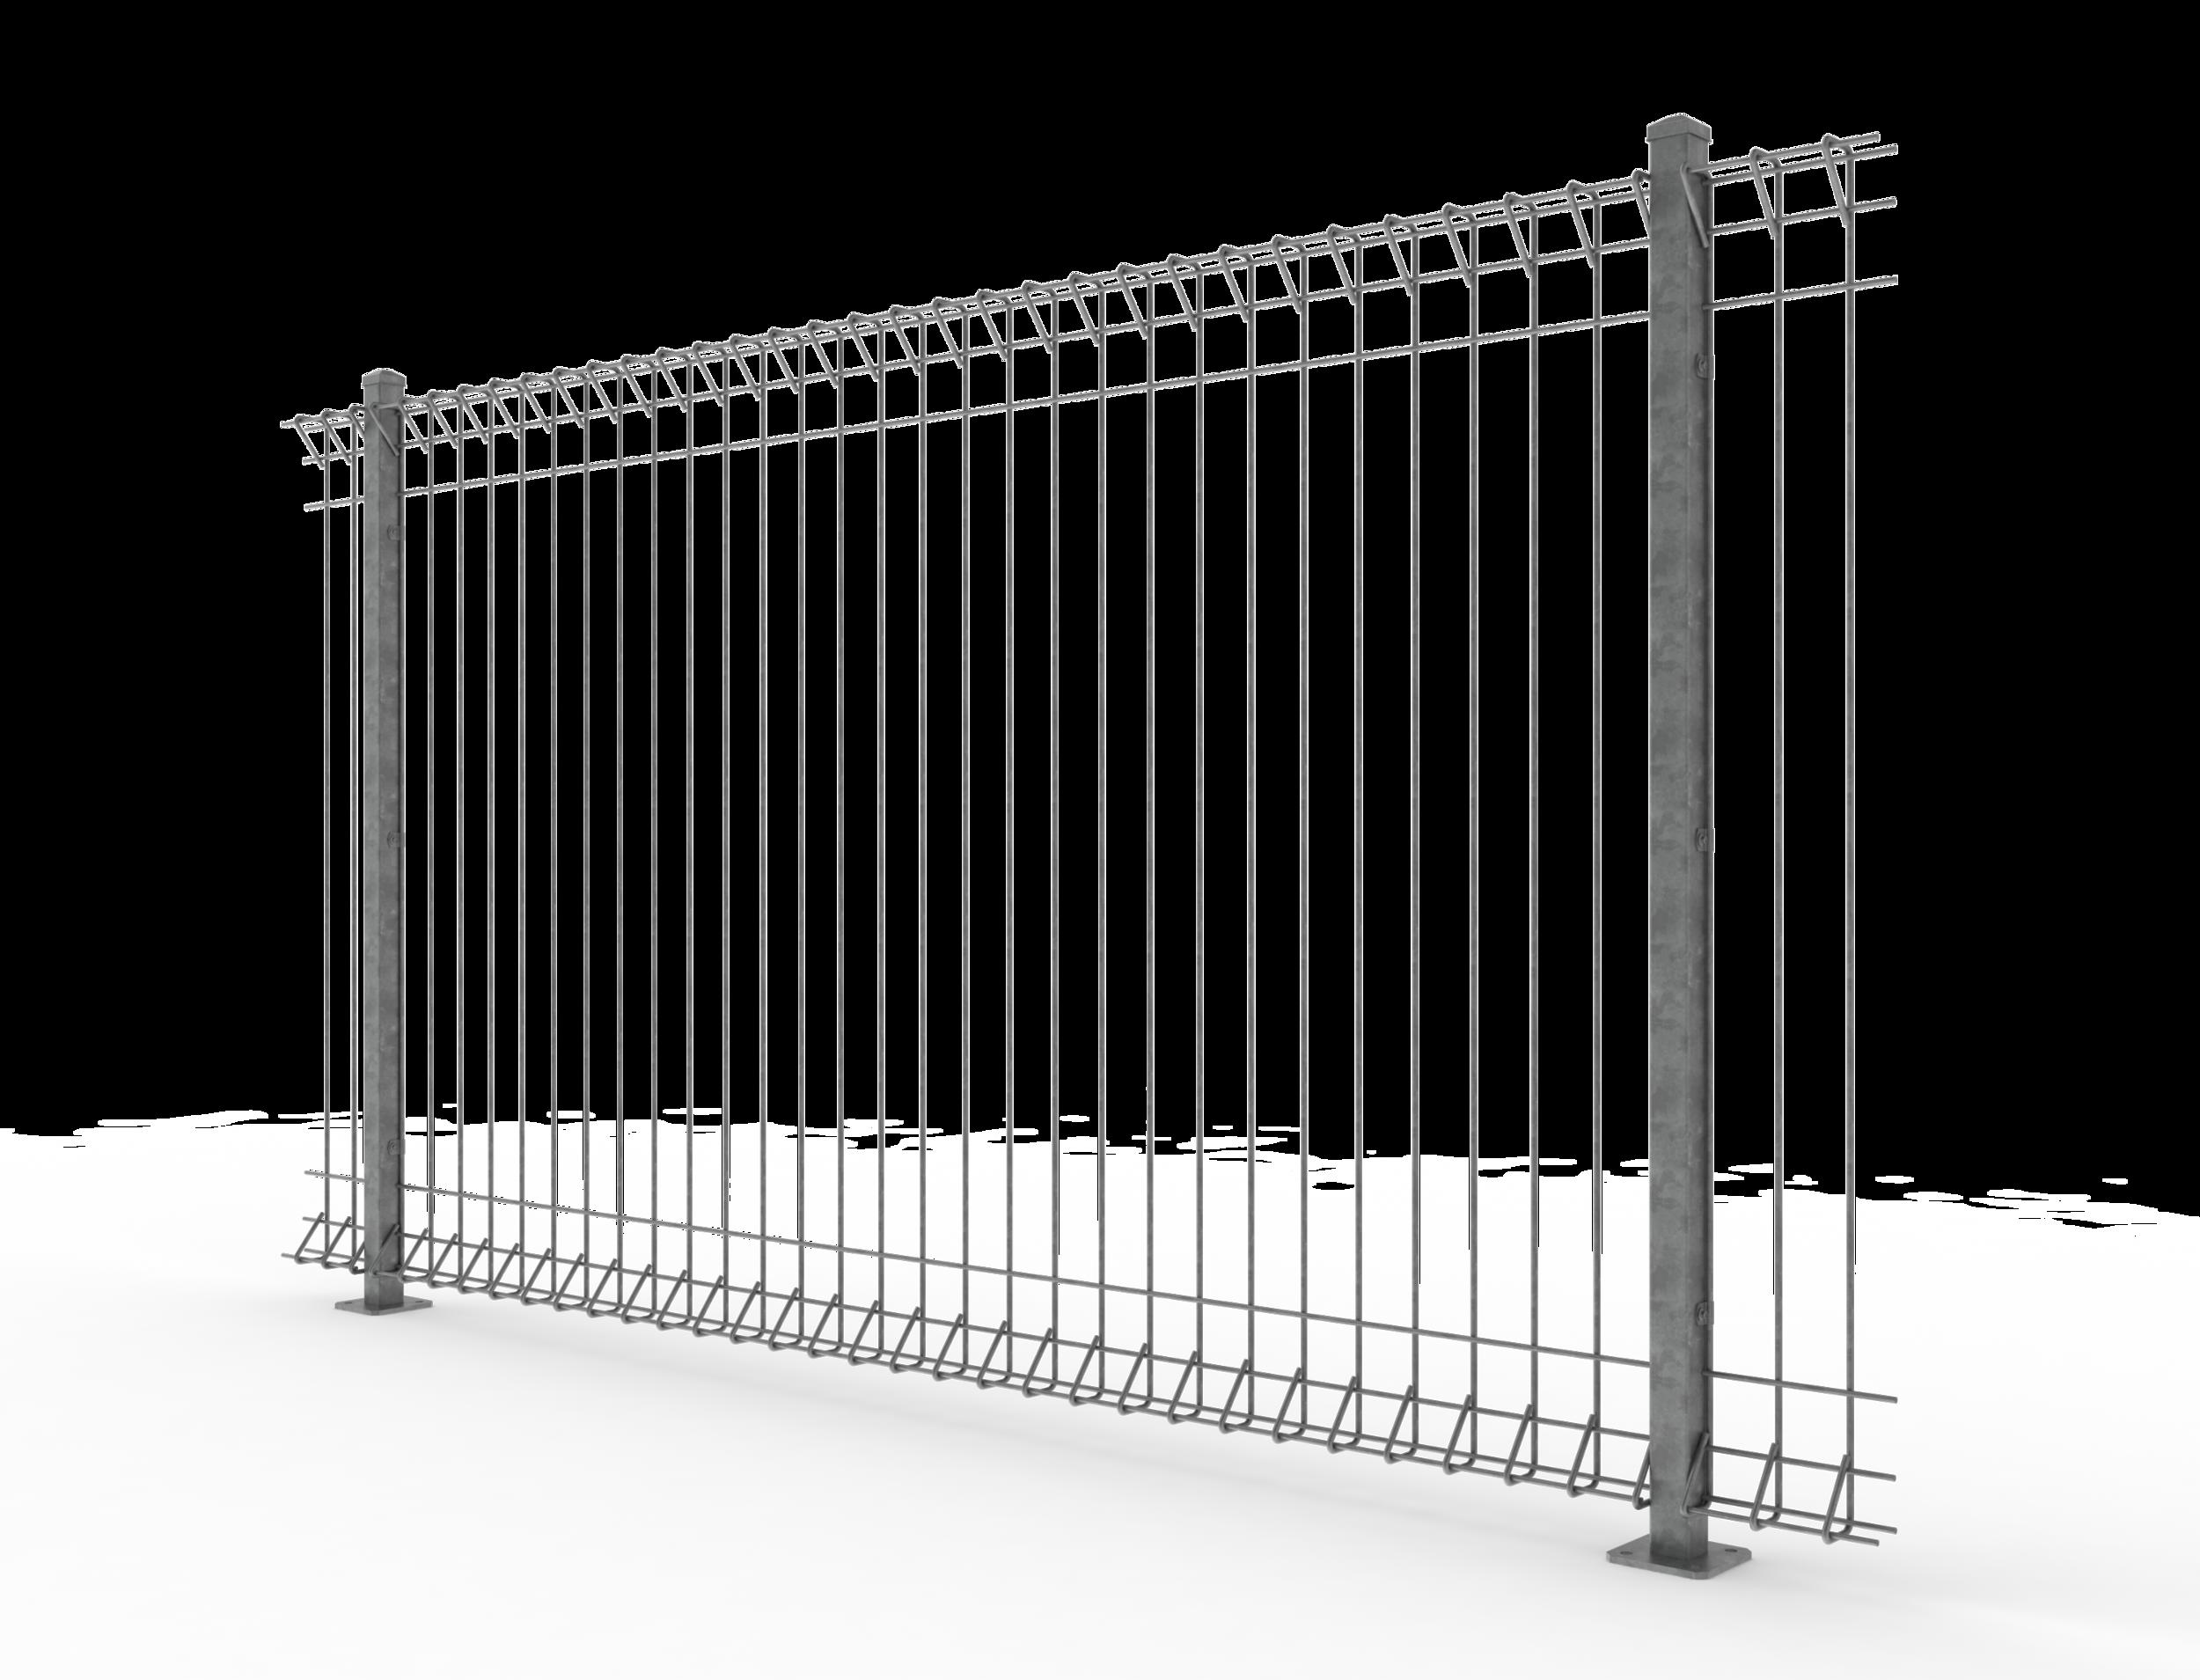 Motorway fencing